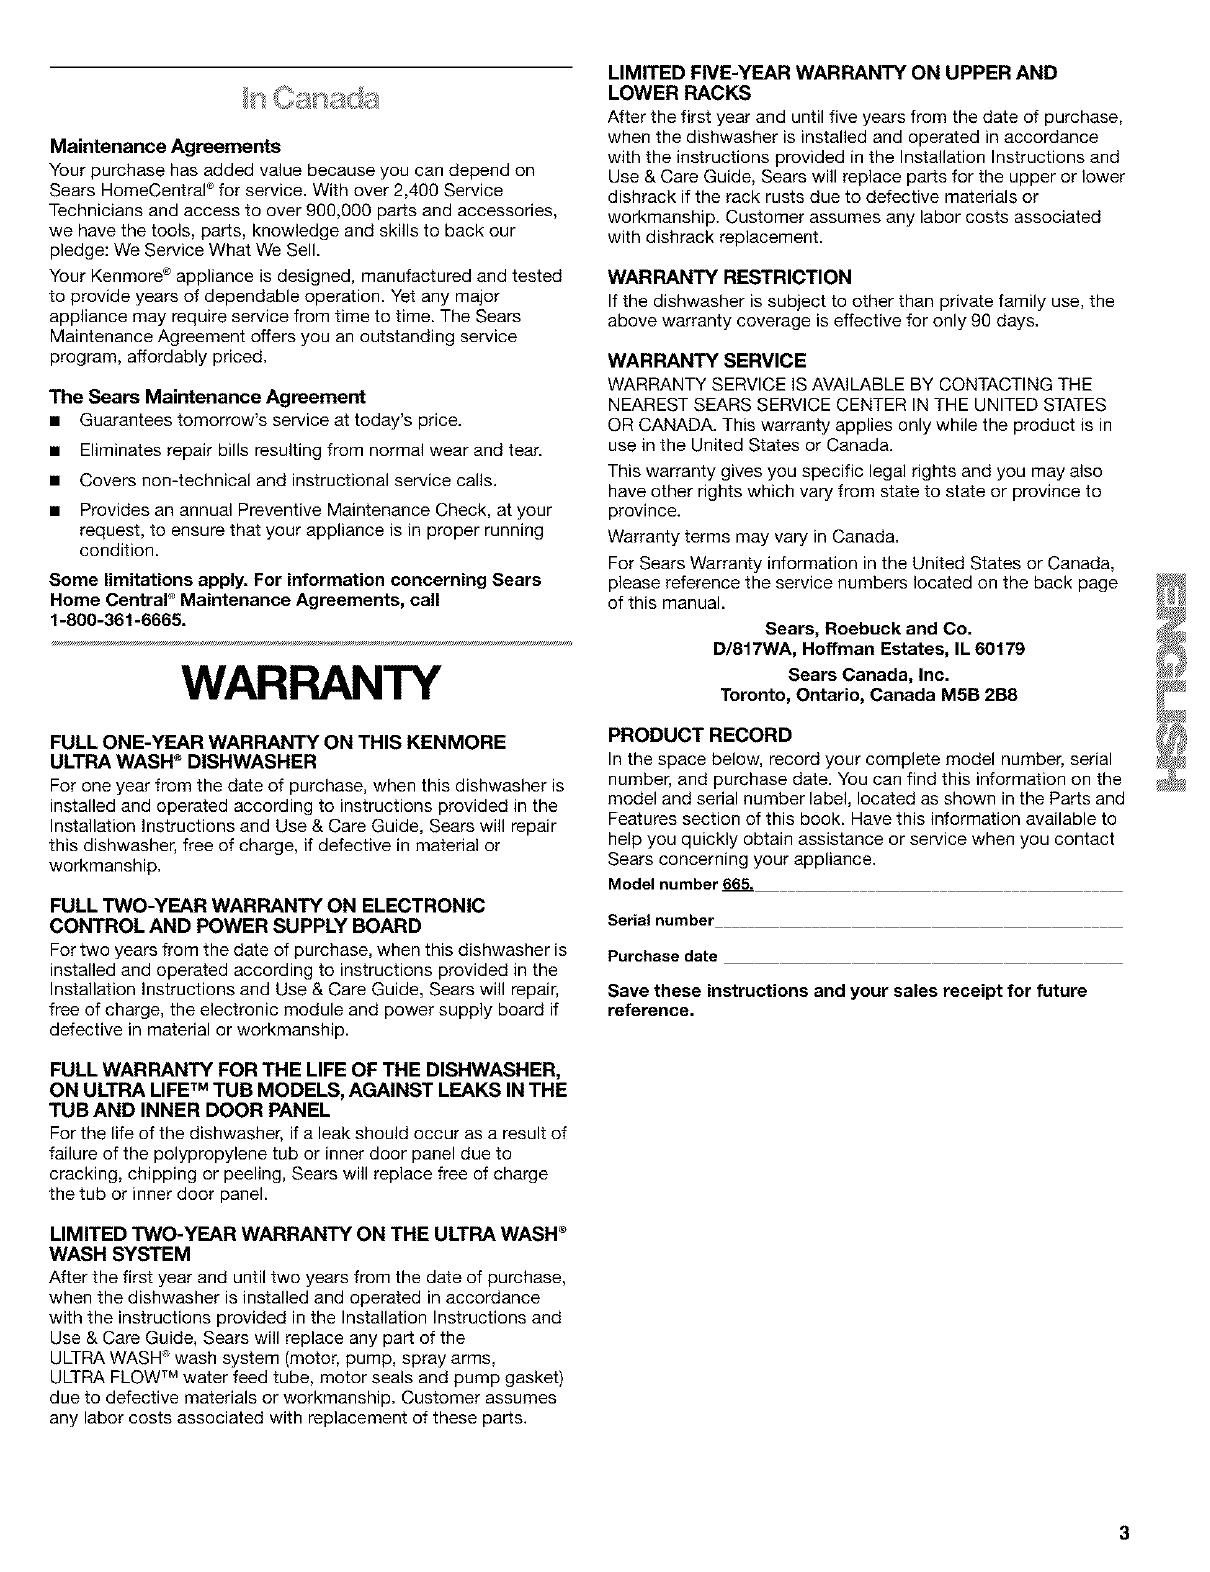 Kenmore 66515784300 User Manual DISHWASHER UNDERCOUNTER